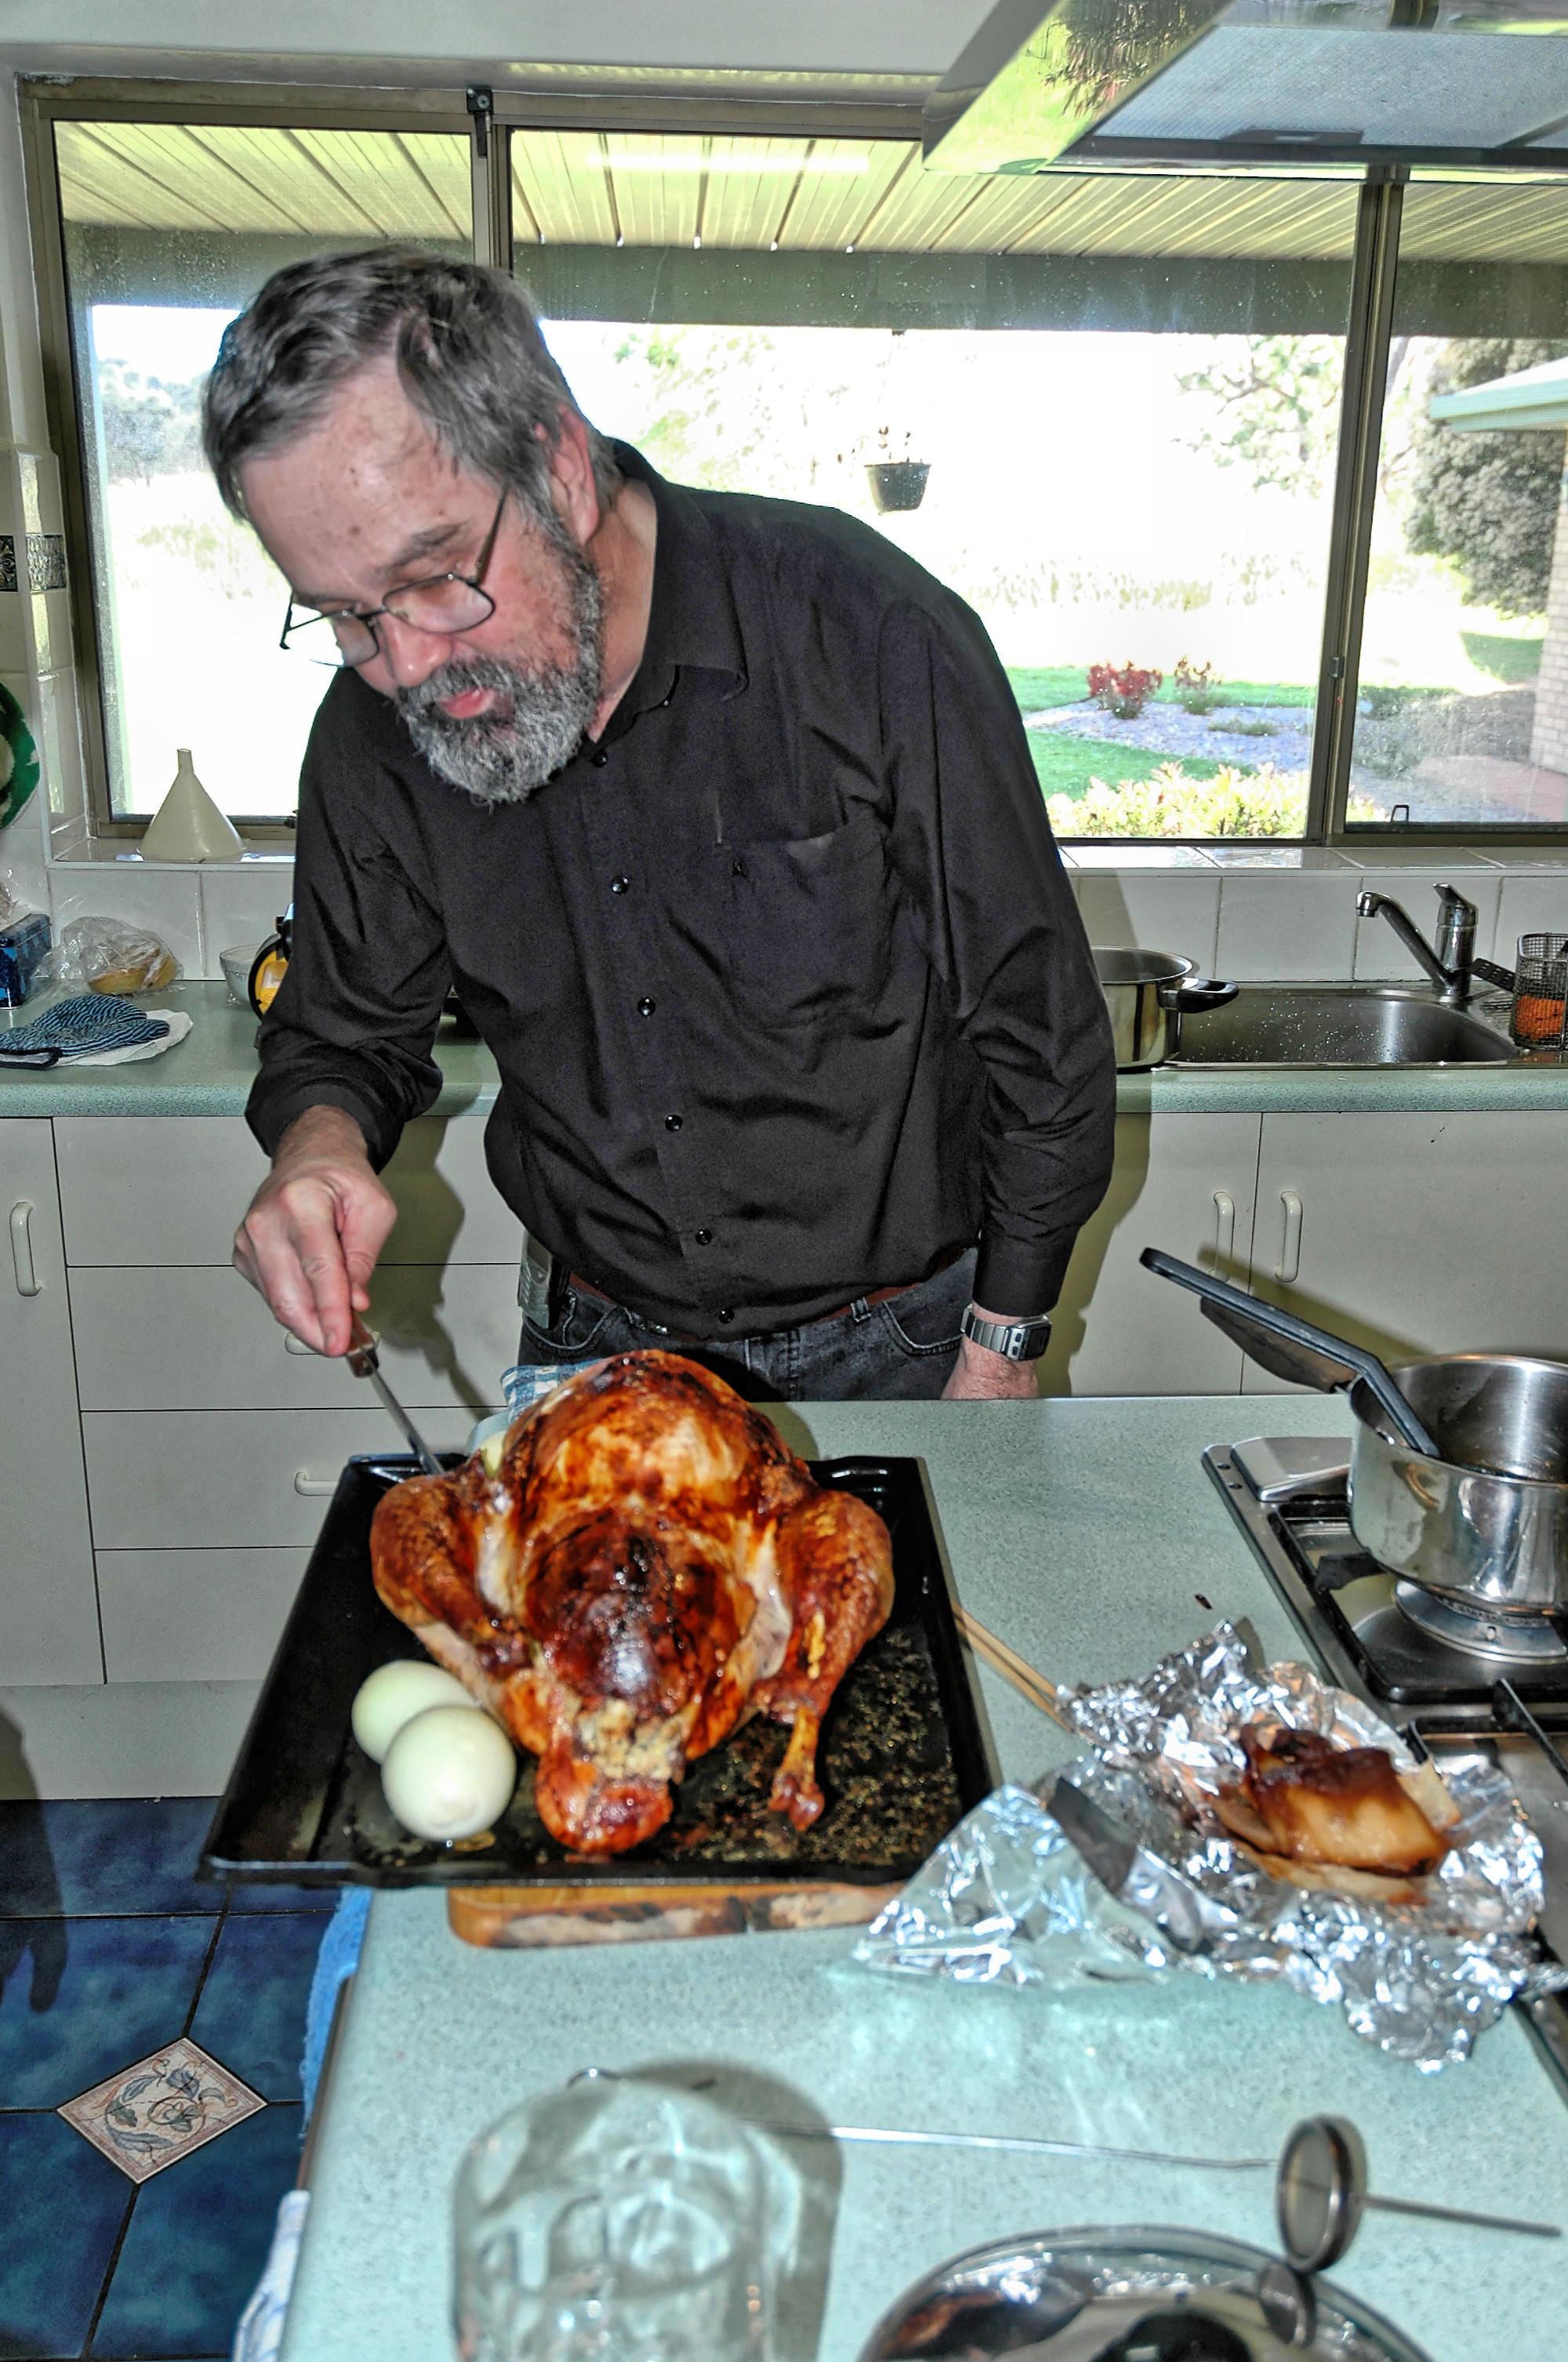 Turkey-carving-11.jpeg